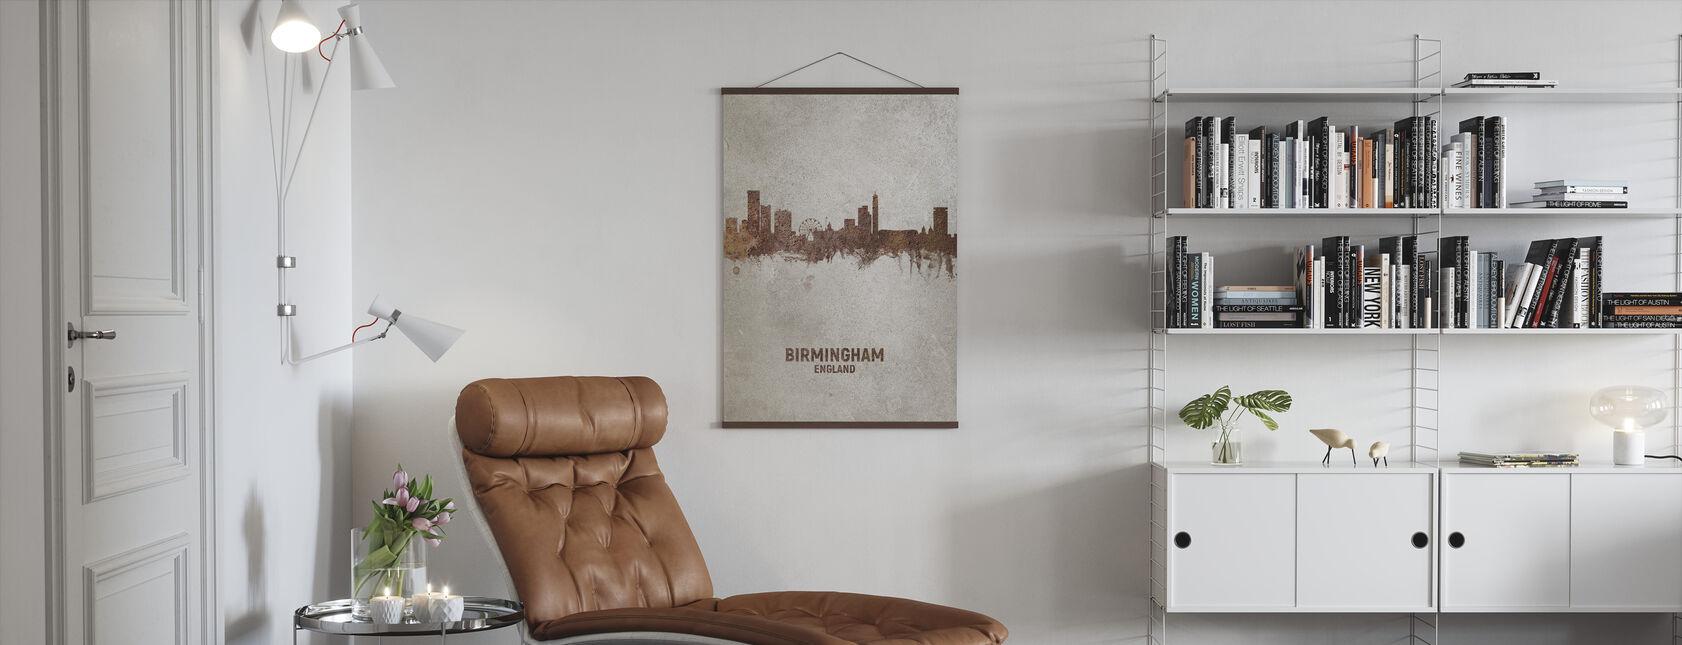 Birmingham England Rust Skyline - Poster - Living Room